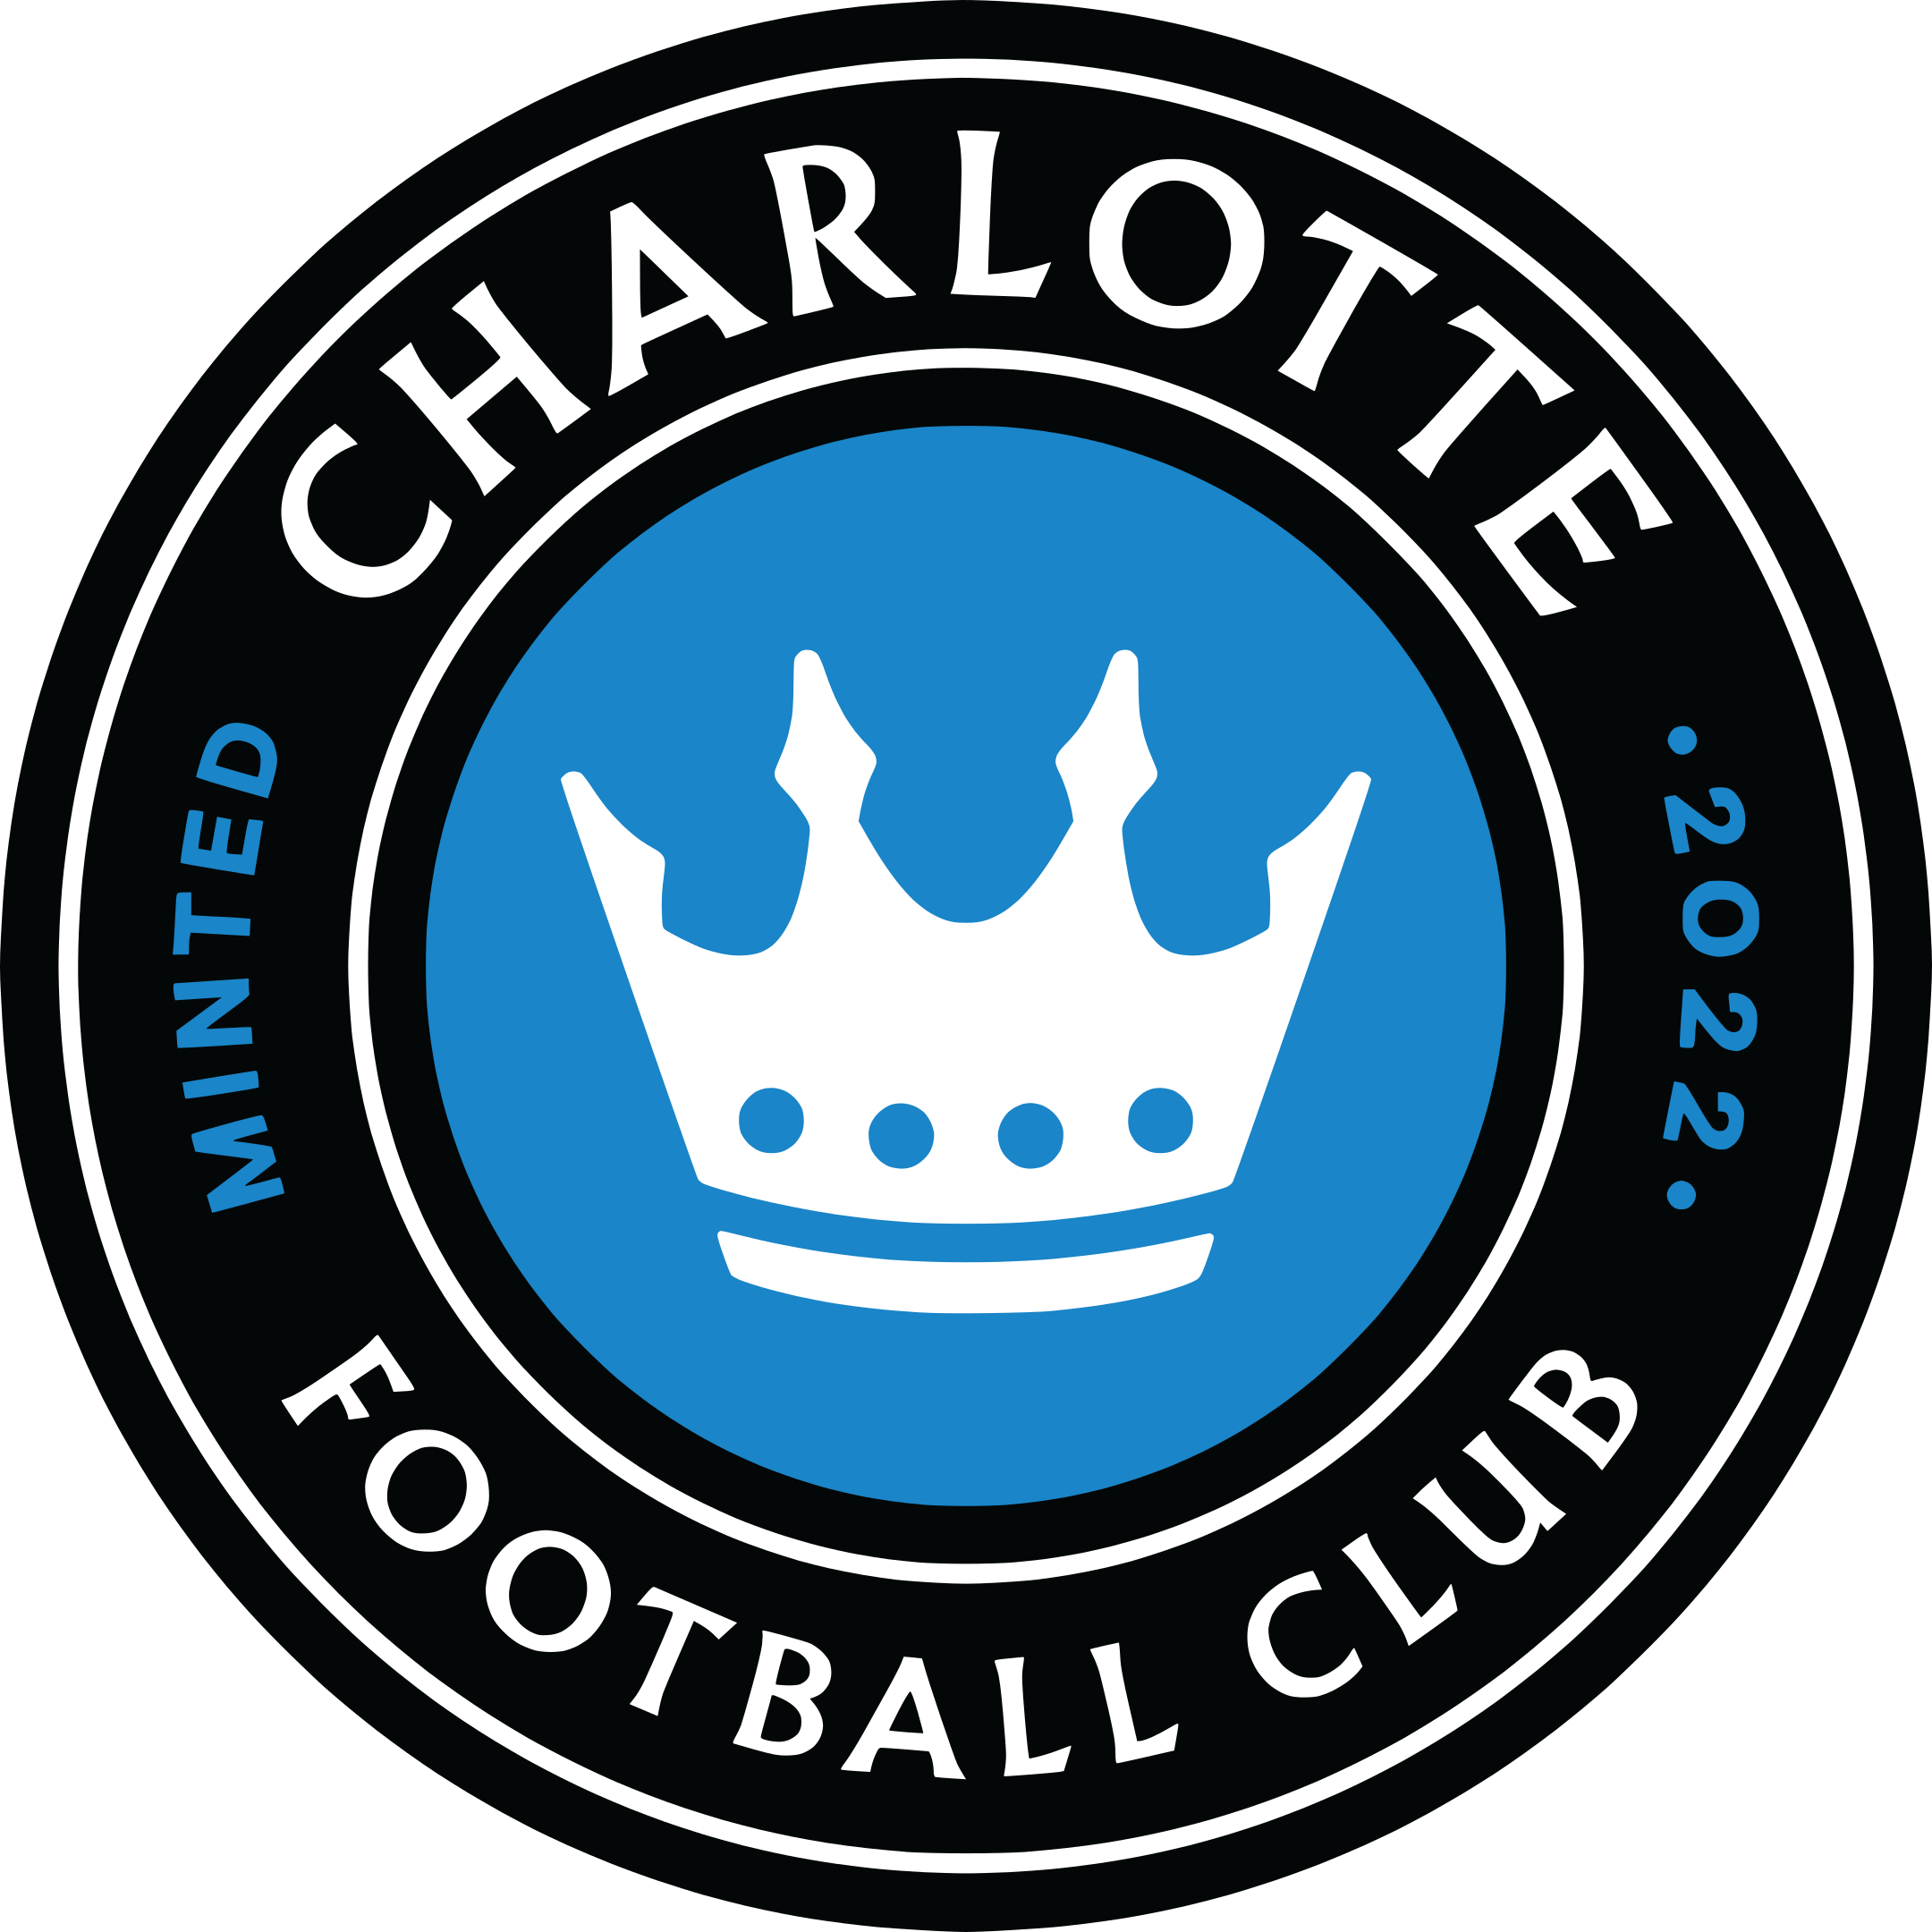 charlotte logo 1 - Charlote FC Logo